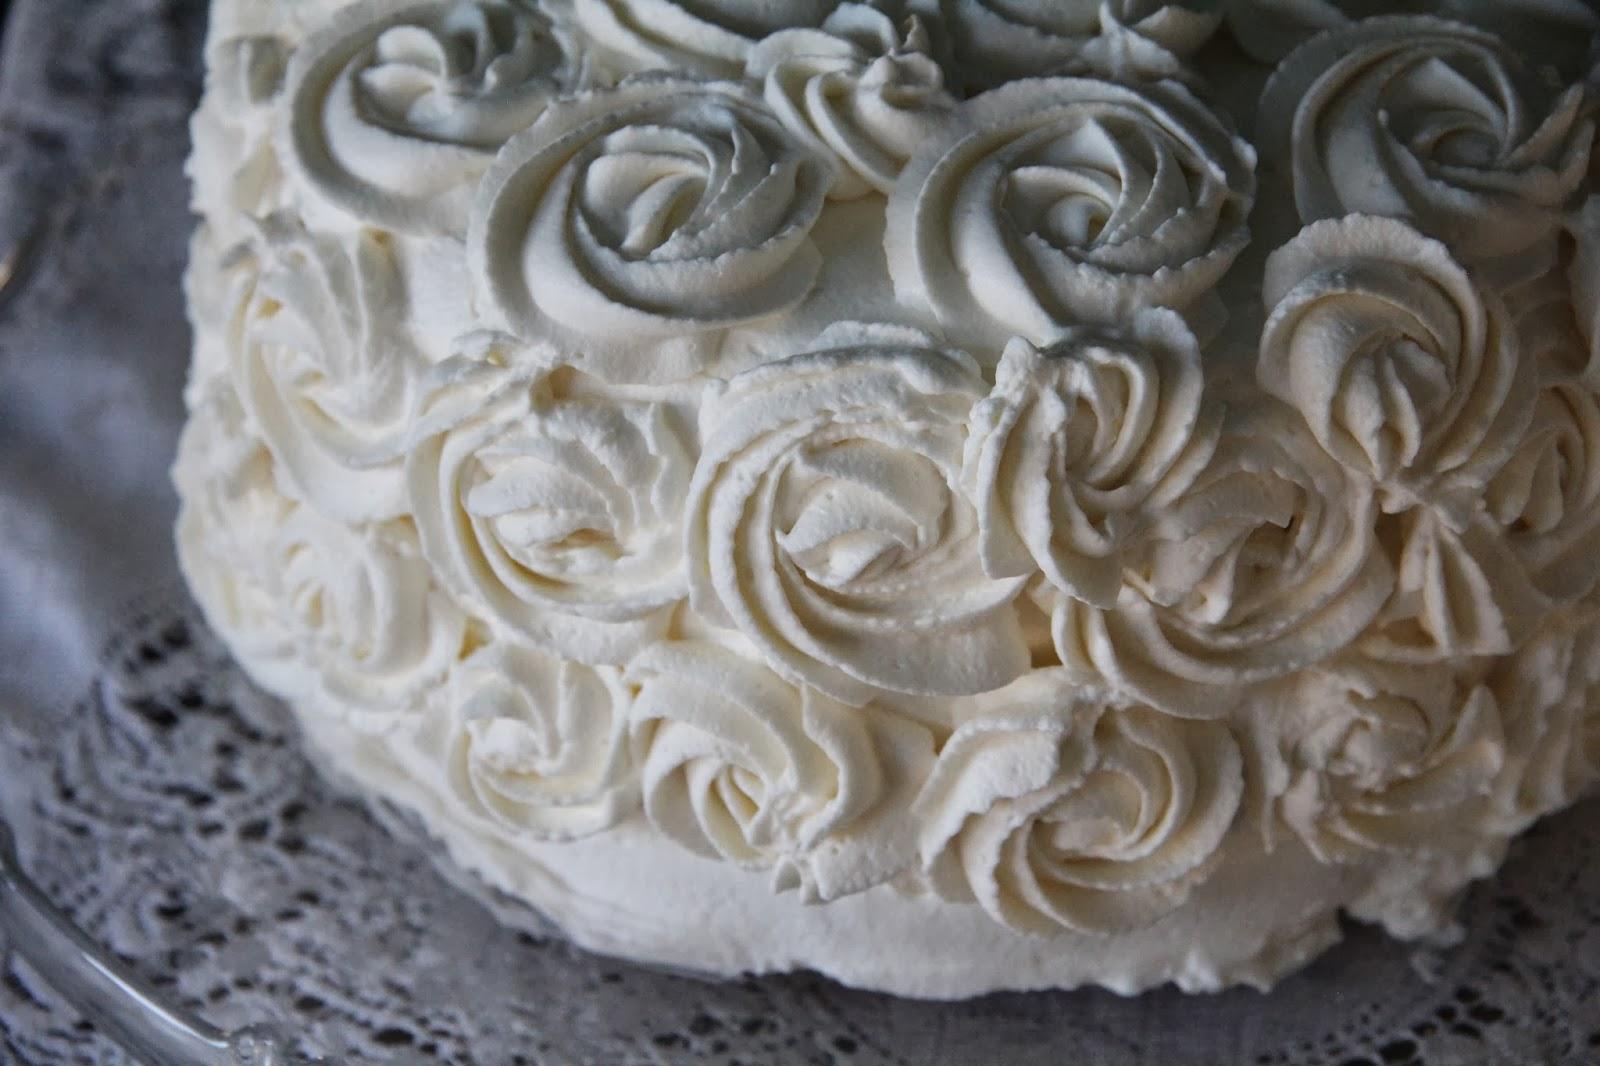 ... Rum Cake, aka Zuppa Inglese (Traditional and Gluten-Free Versions